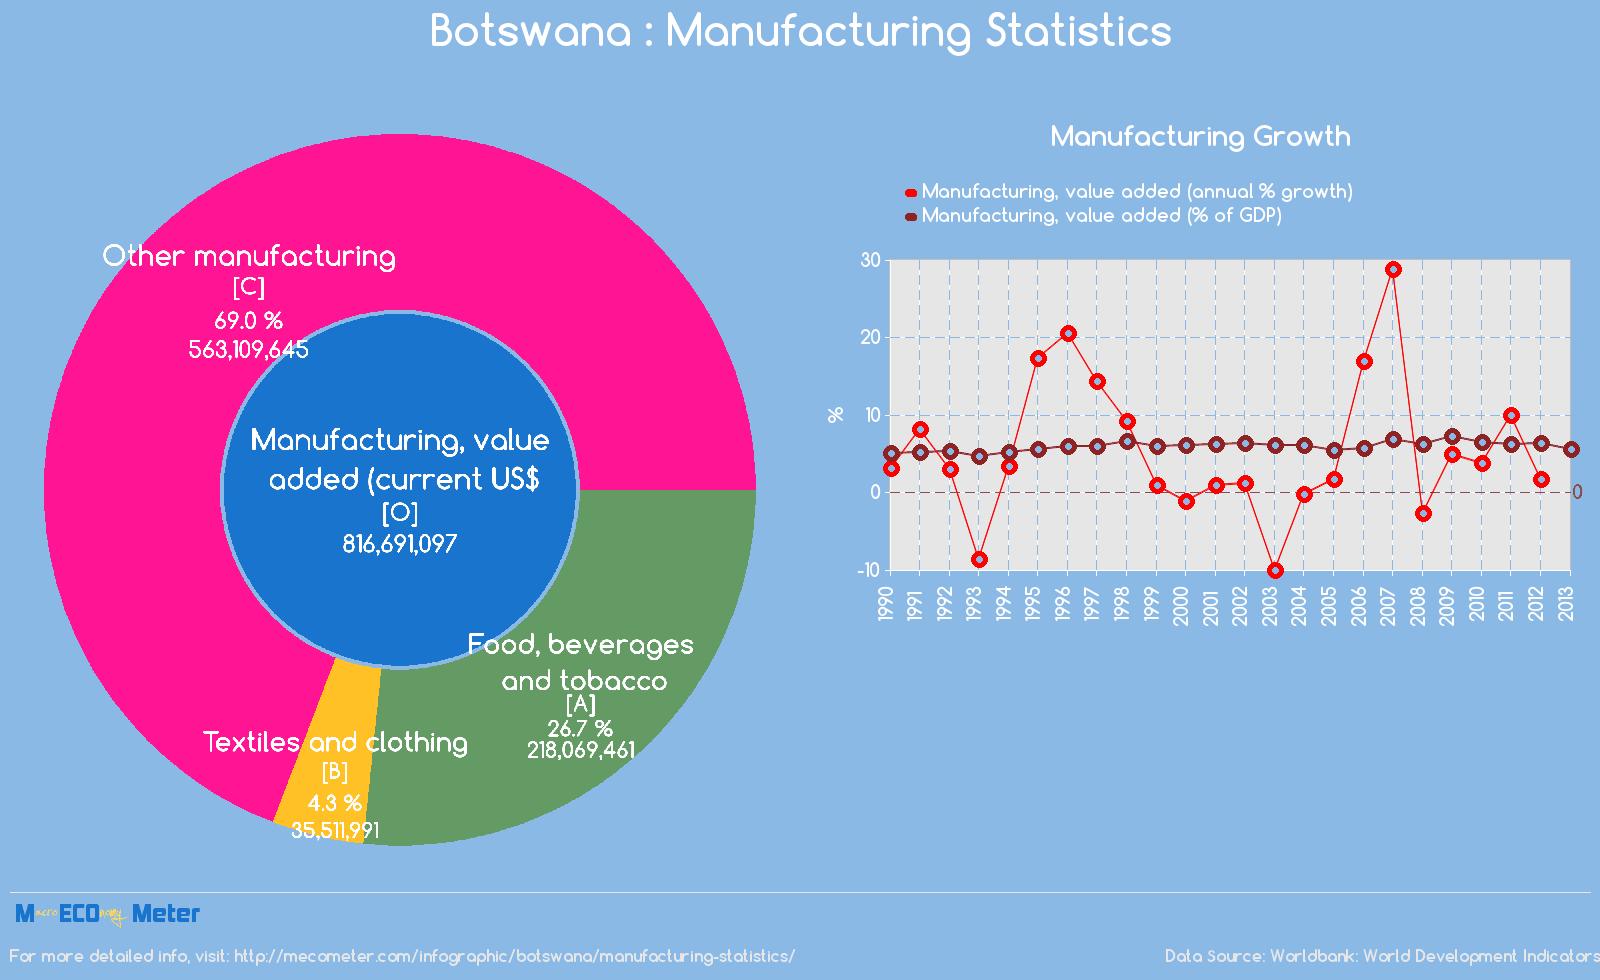 Botswana : Manufacturing Statistics